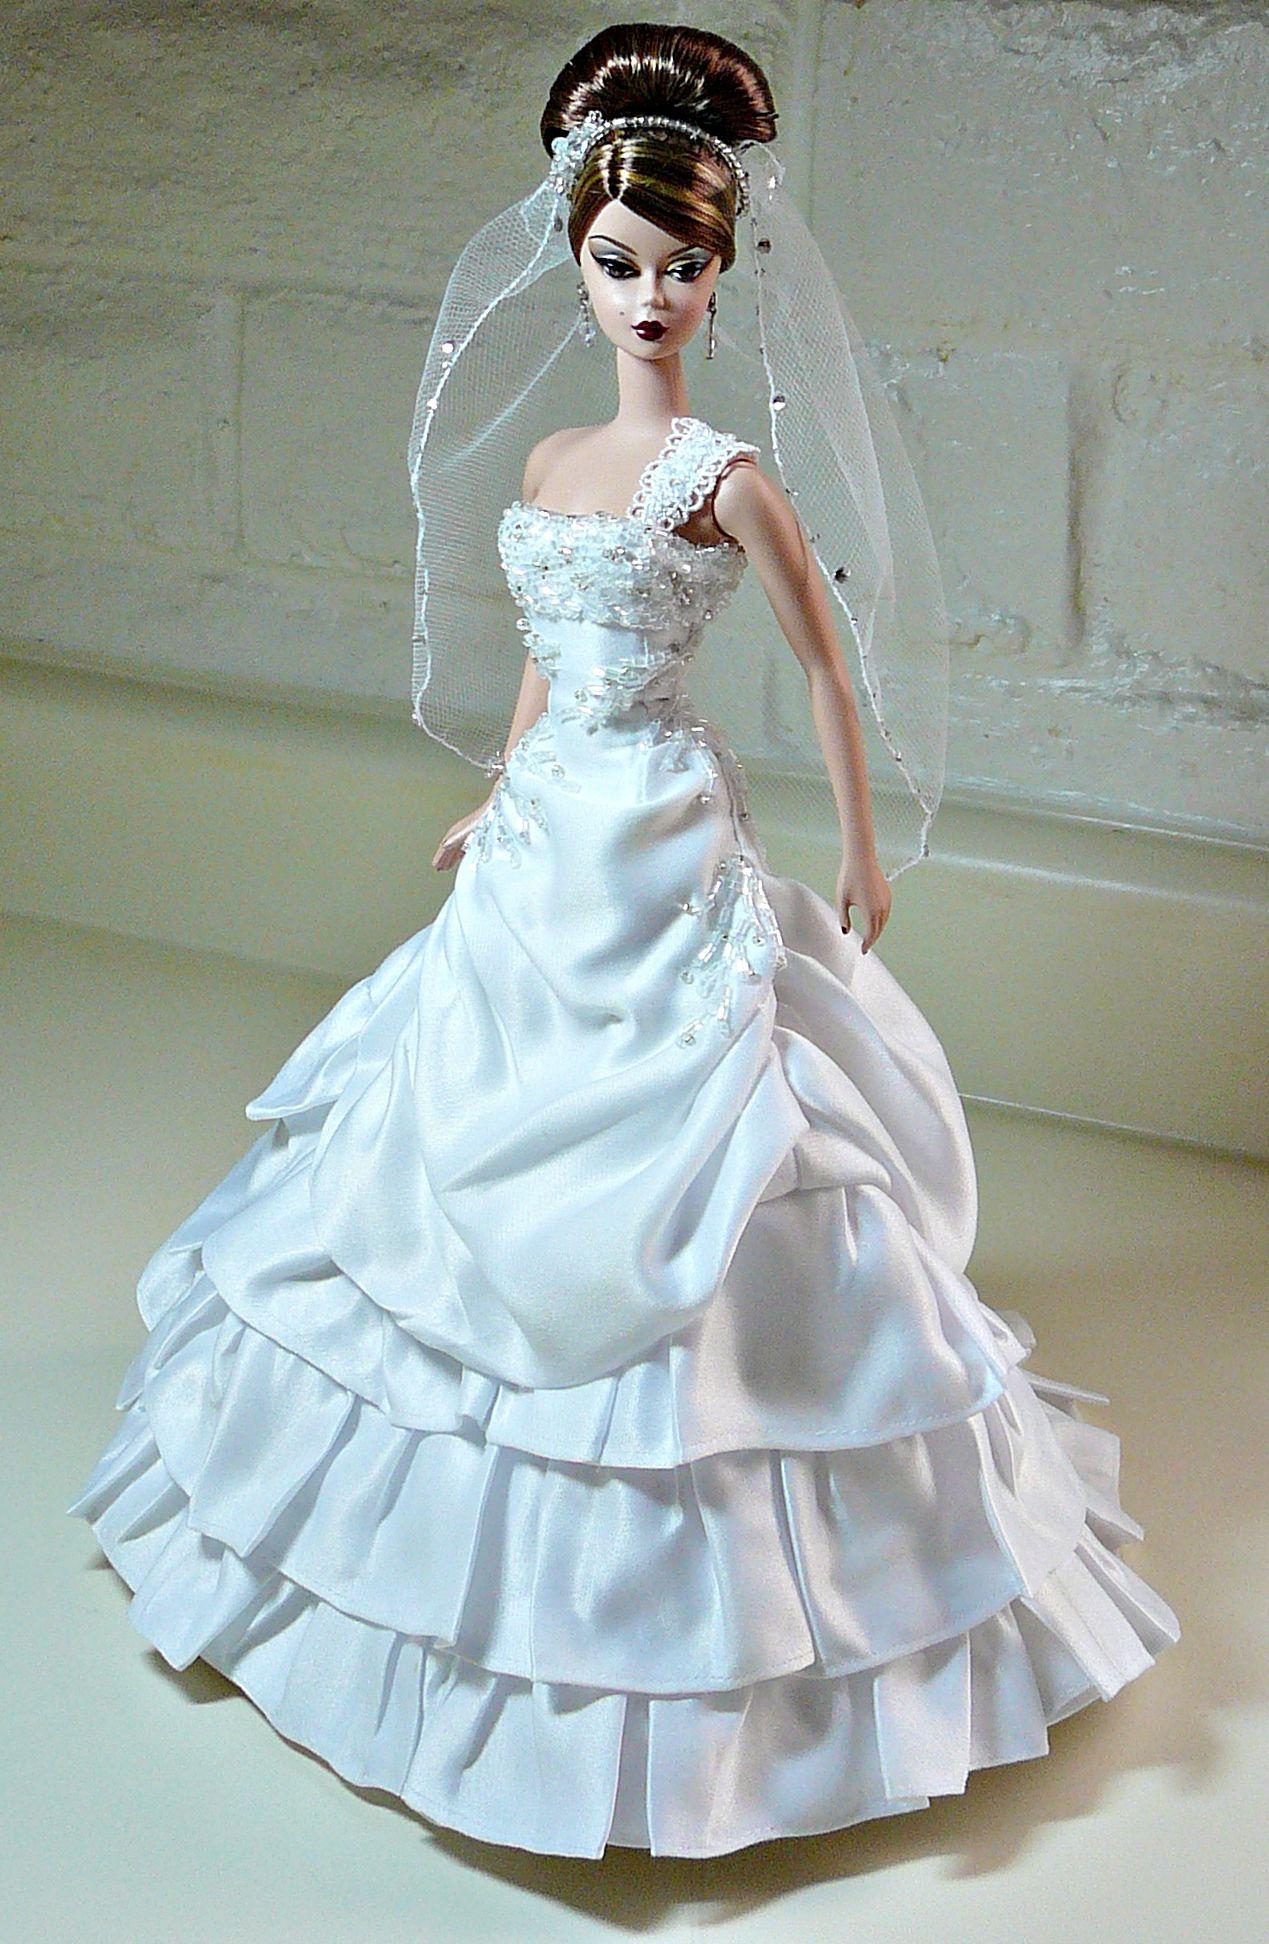 Barbie stole my dress! @Brittany Horton Horton Horton Deeds | Barbie ...